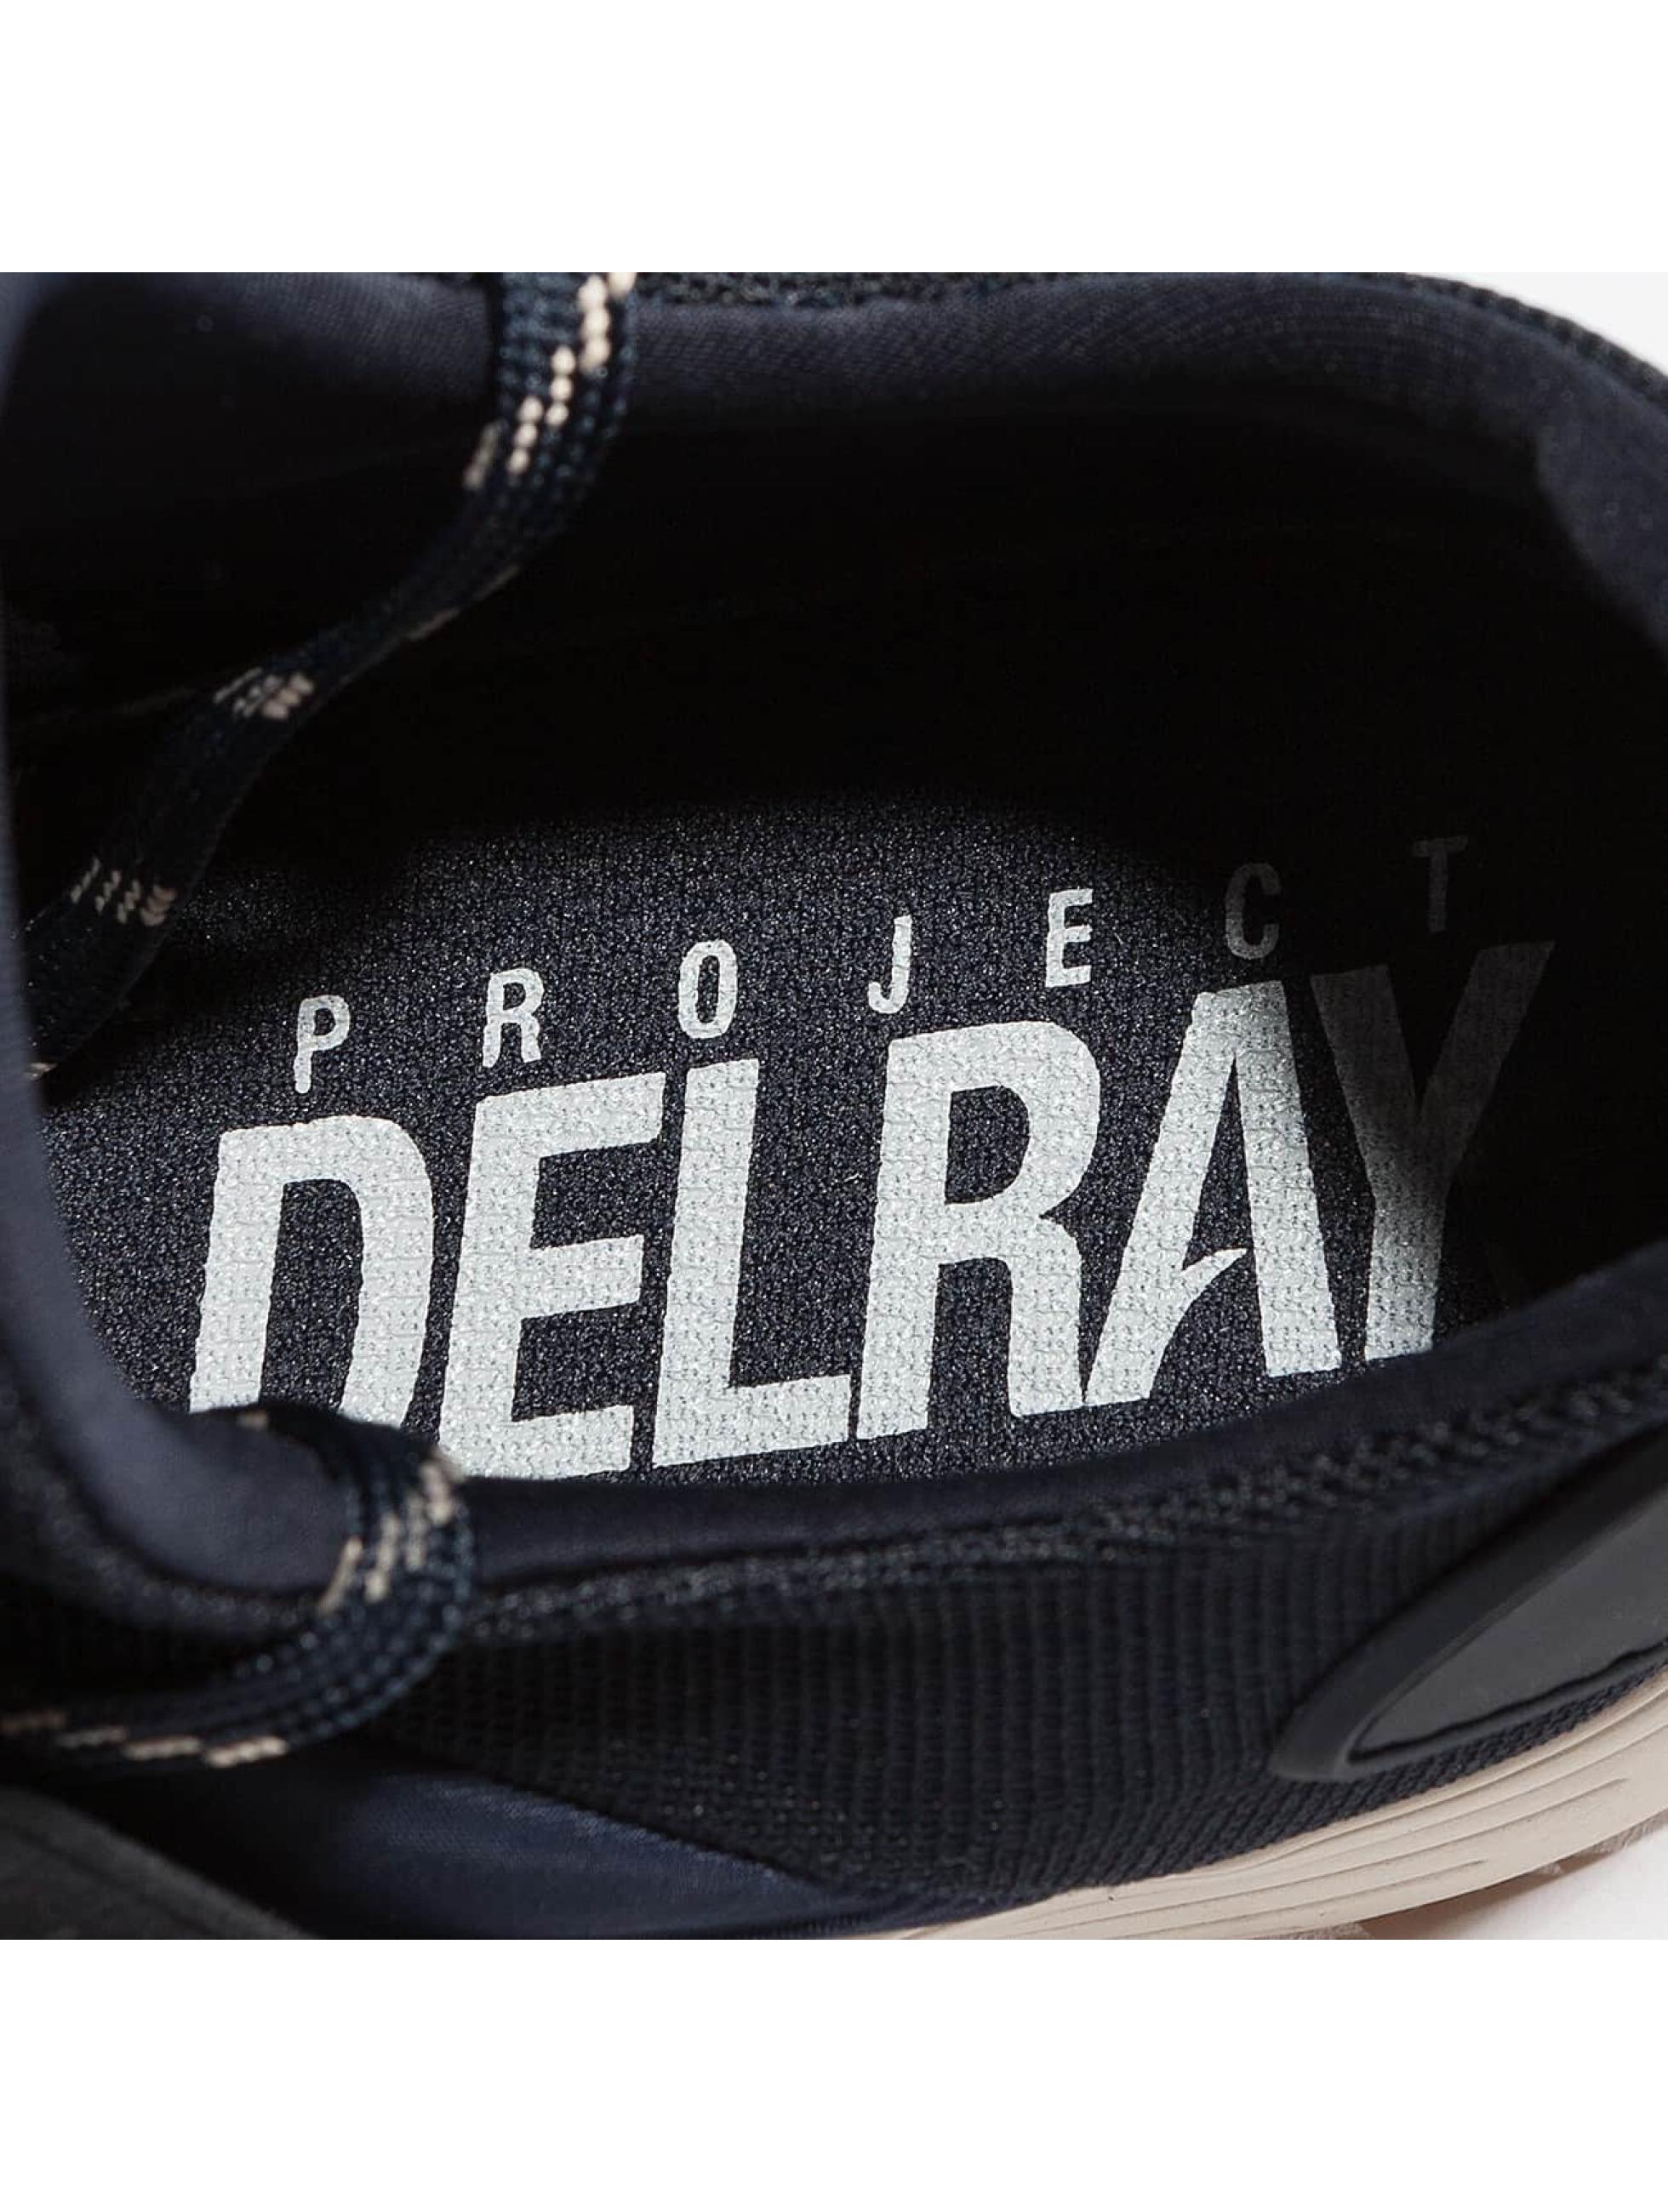 Project Delray Сникеры Wavey синий